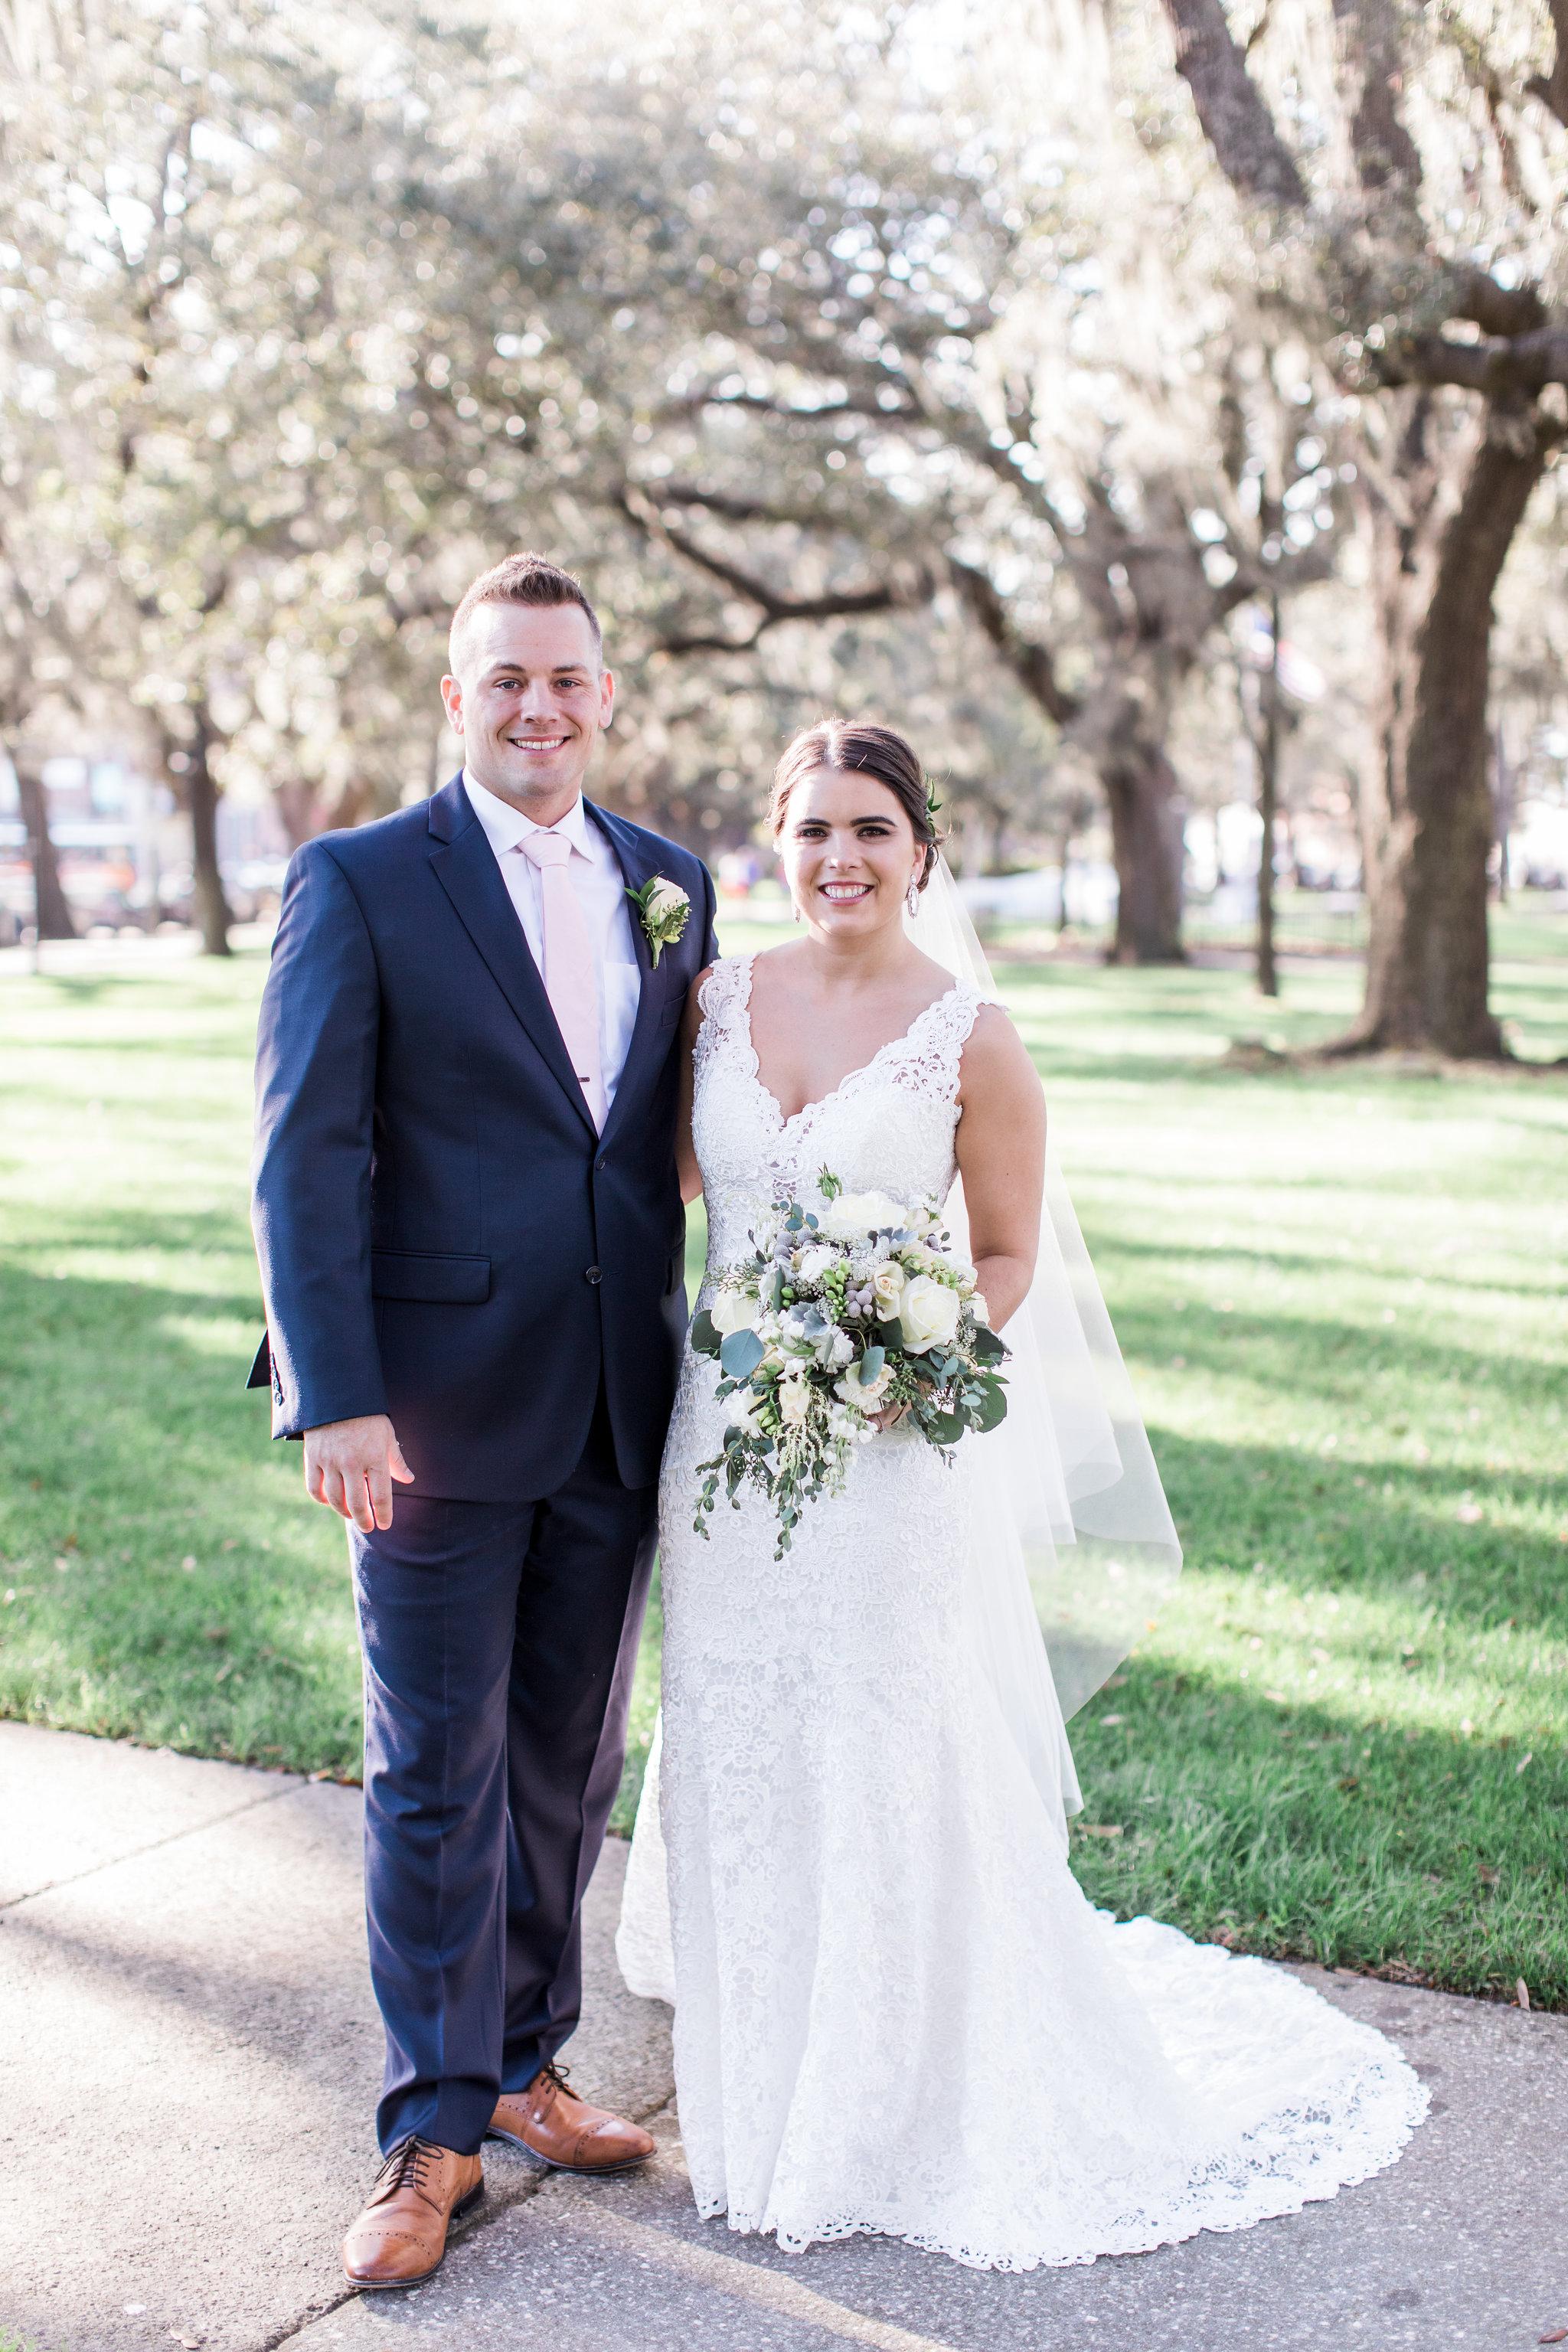 apt-b-photography-Savannah-wedding-photographer-savannah-engagement-photographer-historic-savannah-engagement-charles-h-morris-center-wedding-savannah-weddings-17.JPG